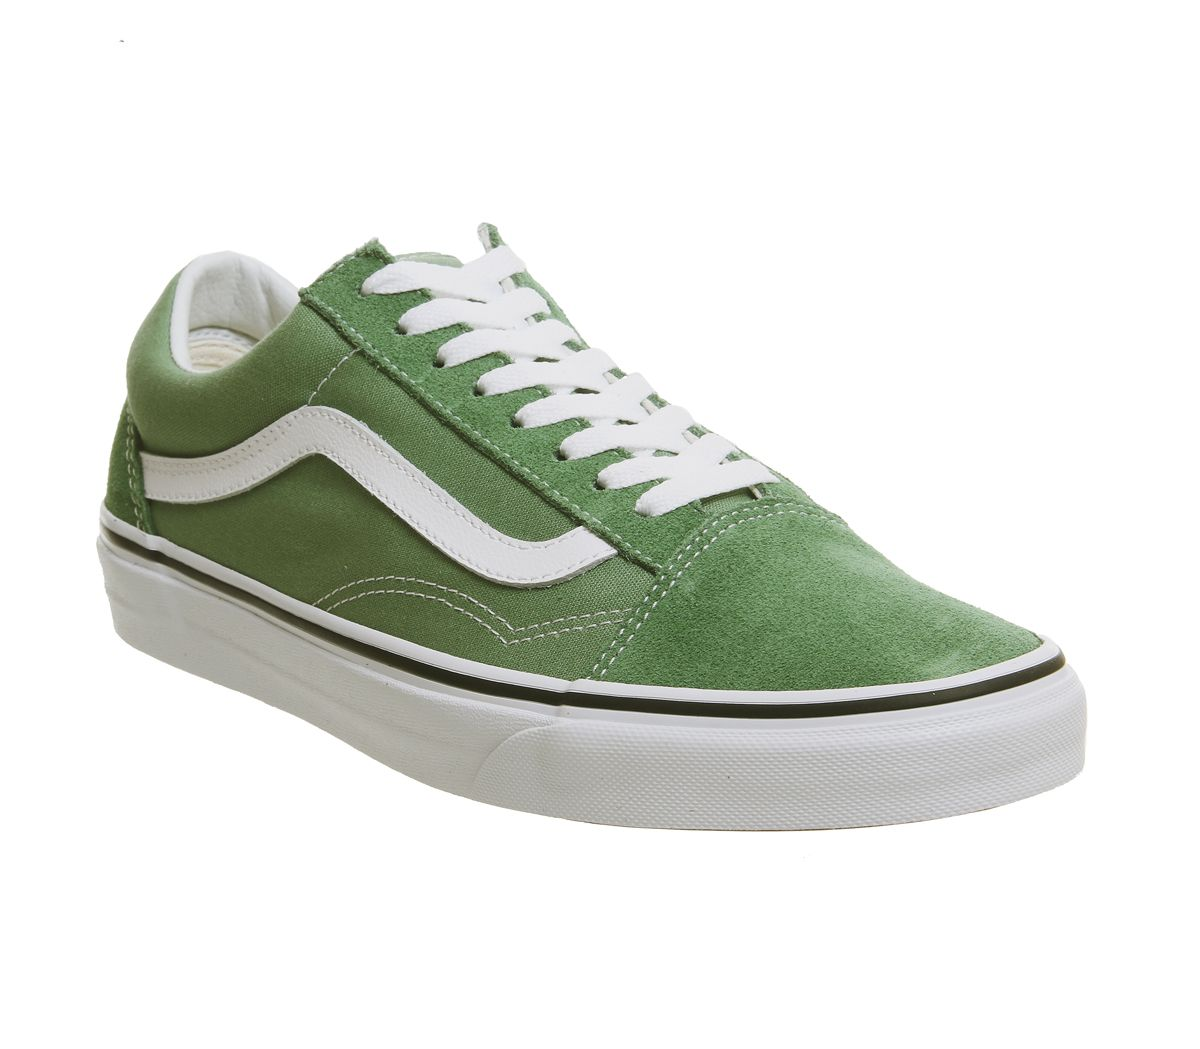 ee97b13701 Vans Old Skool Trainers Deep Grass Green True White - Unisex Sports